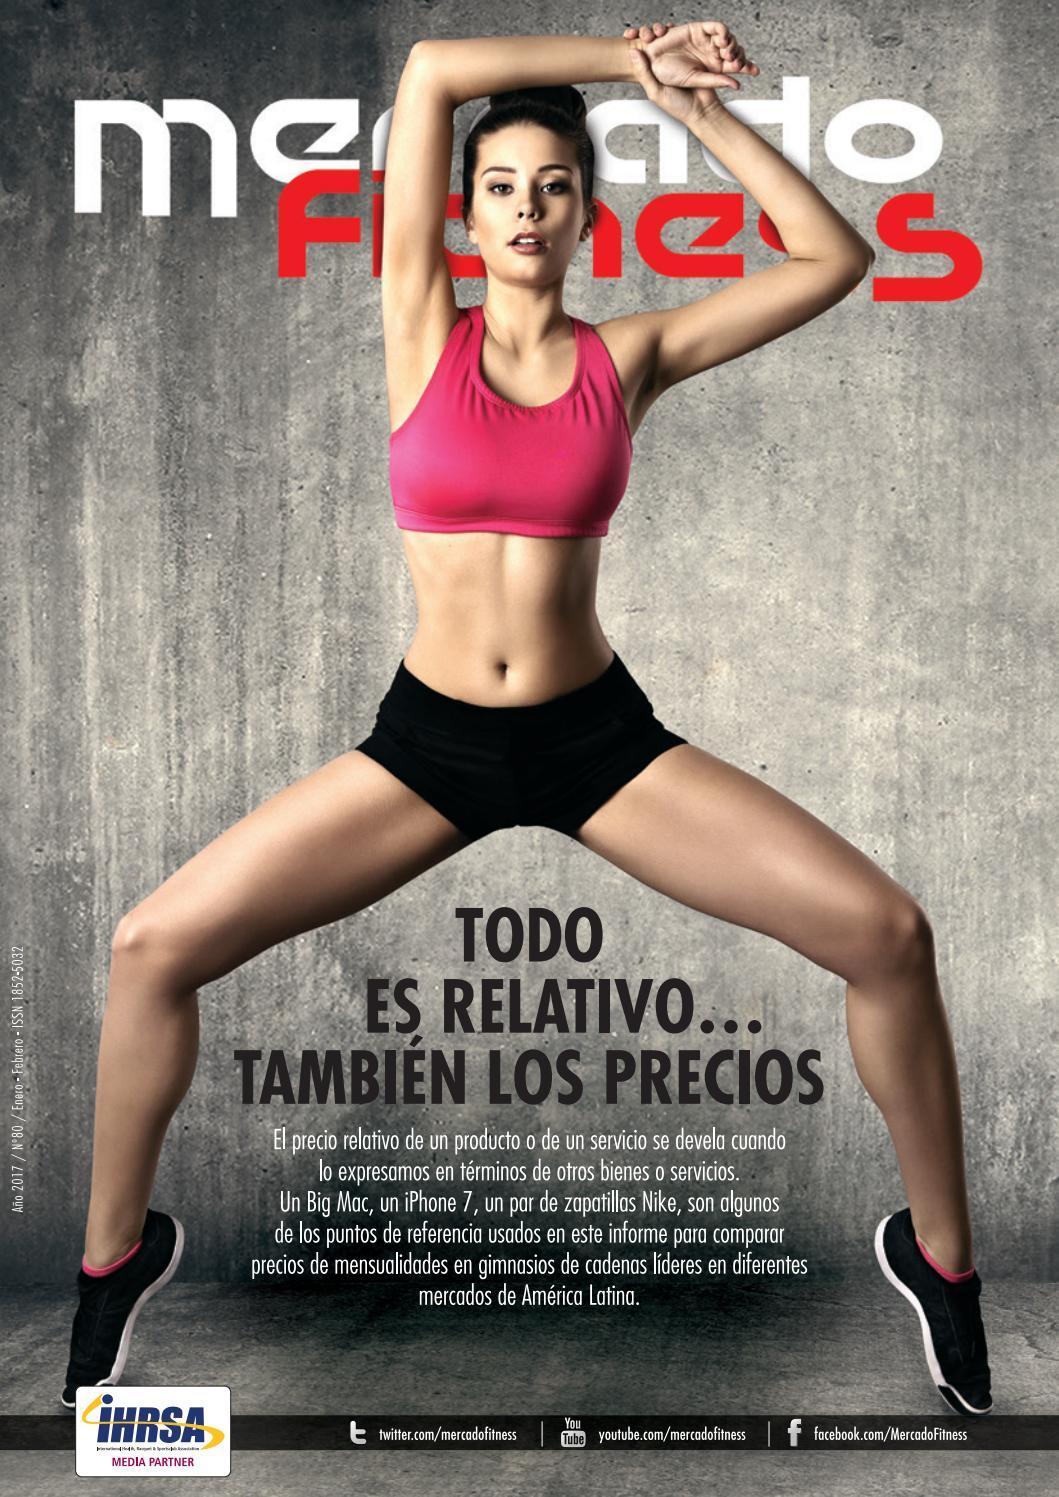 Dieta para competir fitness mujer